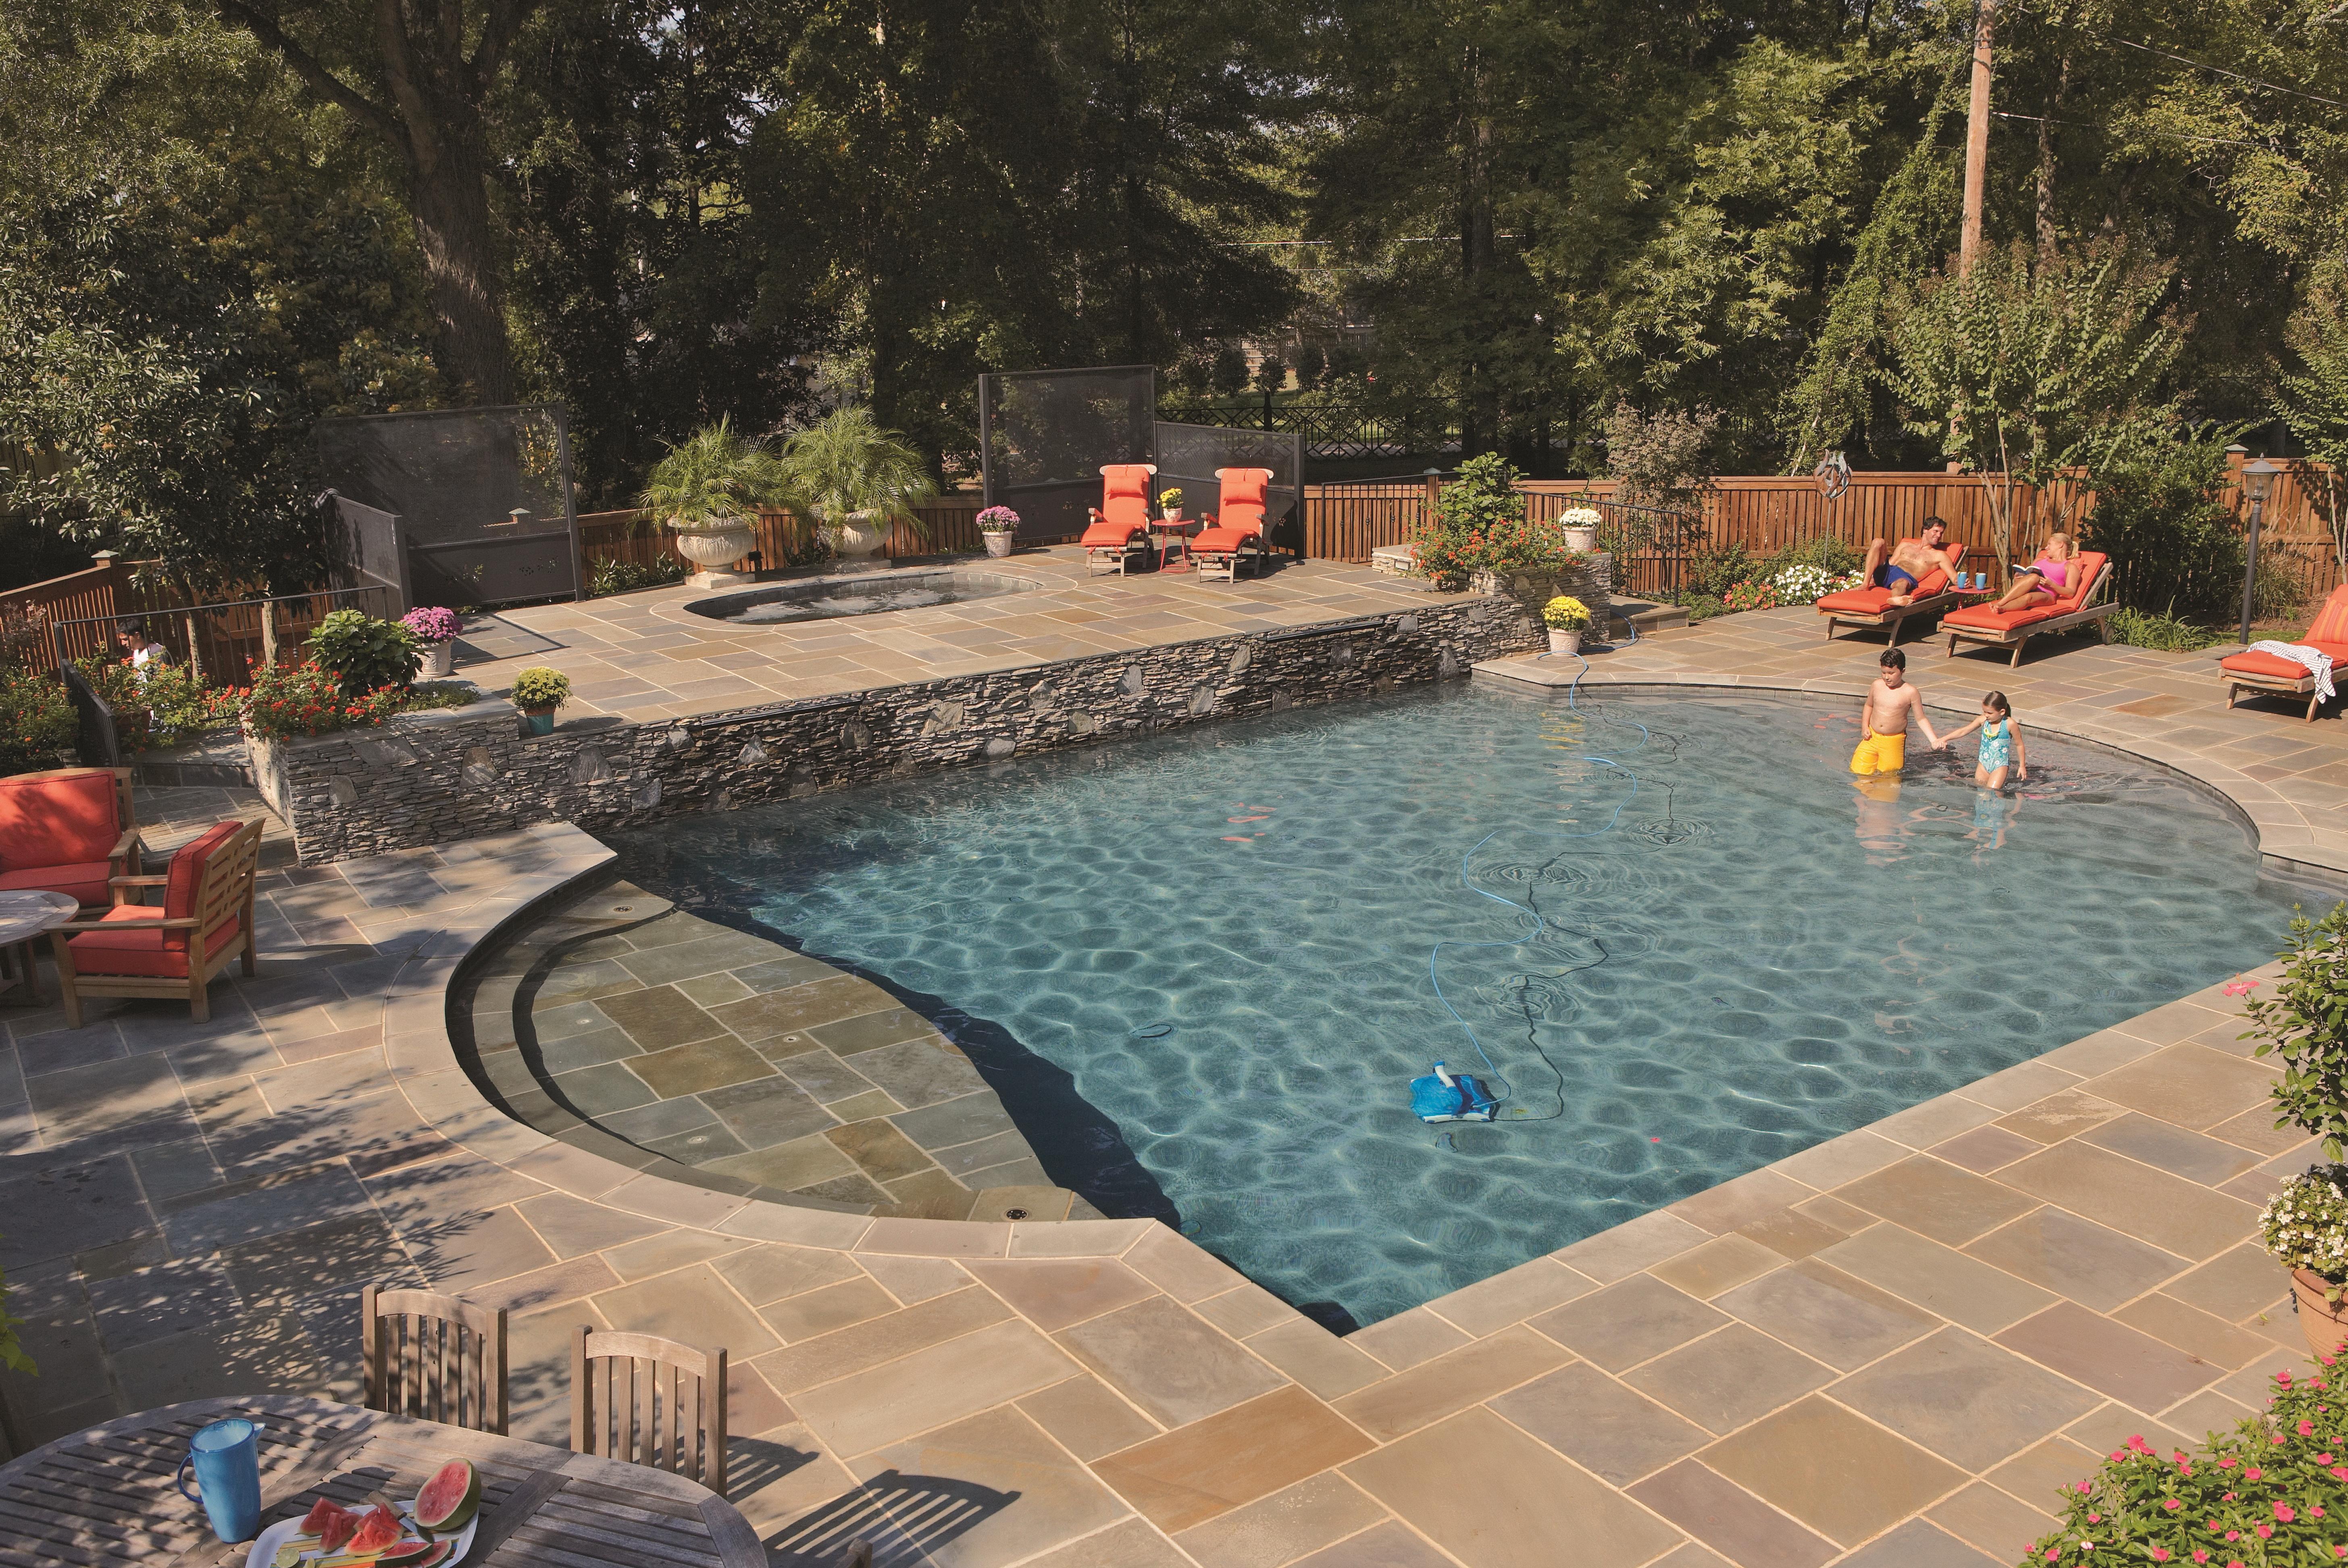 Best Decking Material Around Pool Home Design Ideas